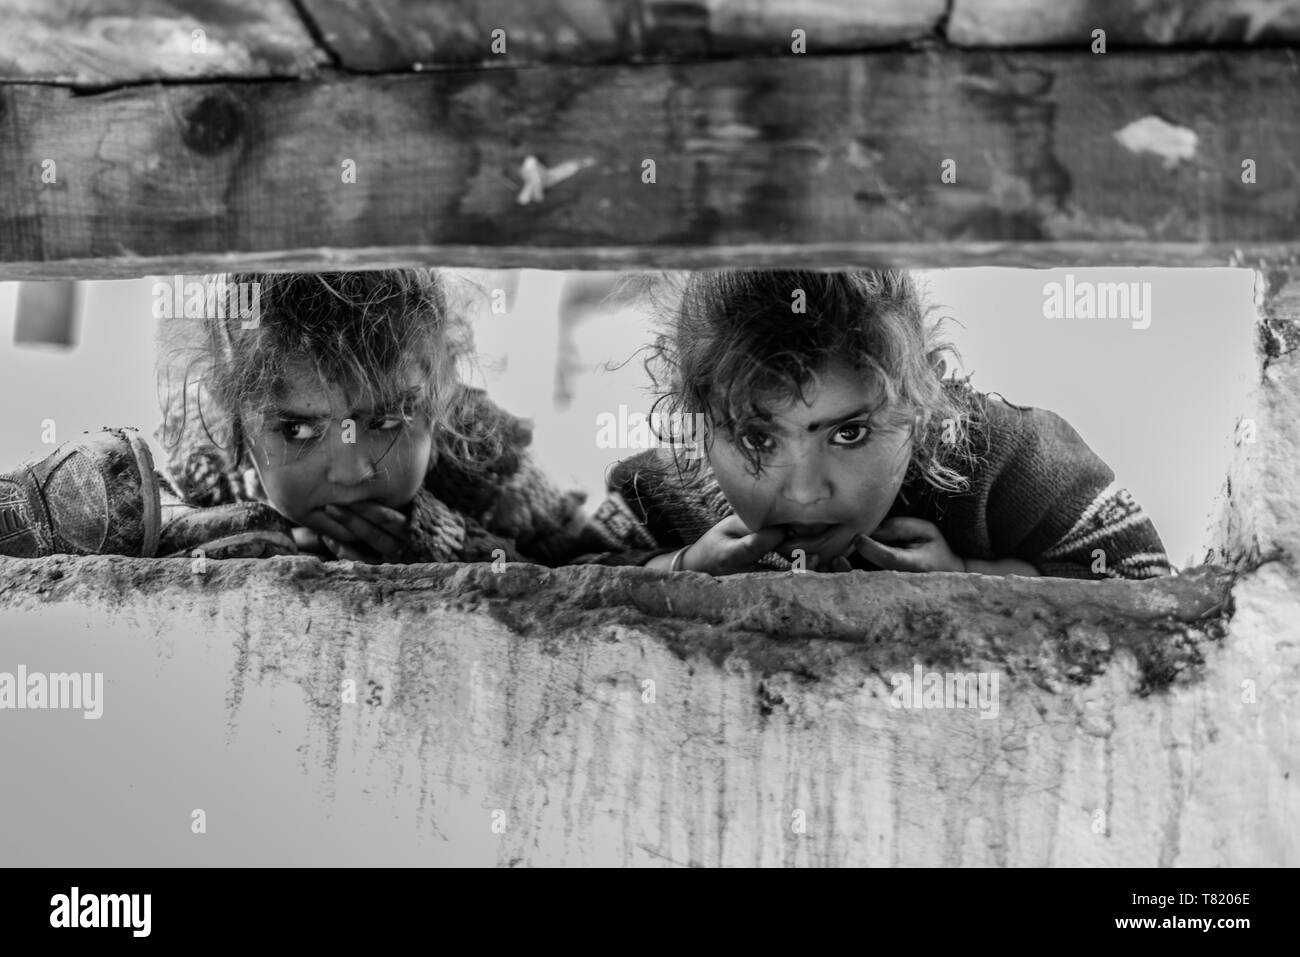 Kullu, Himachal Pradesh, India - April 01, 2019 : Photo of Kids in their house in Himalayan village - - Stock Image